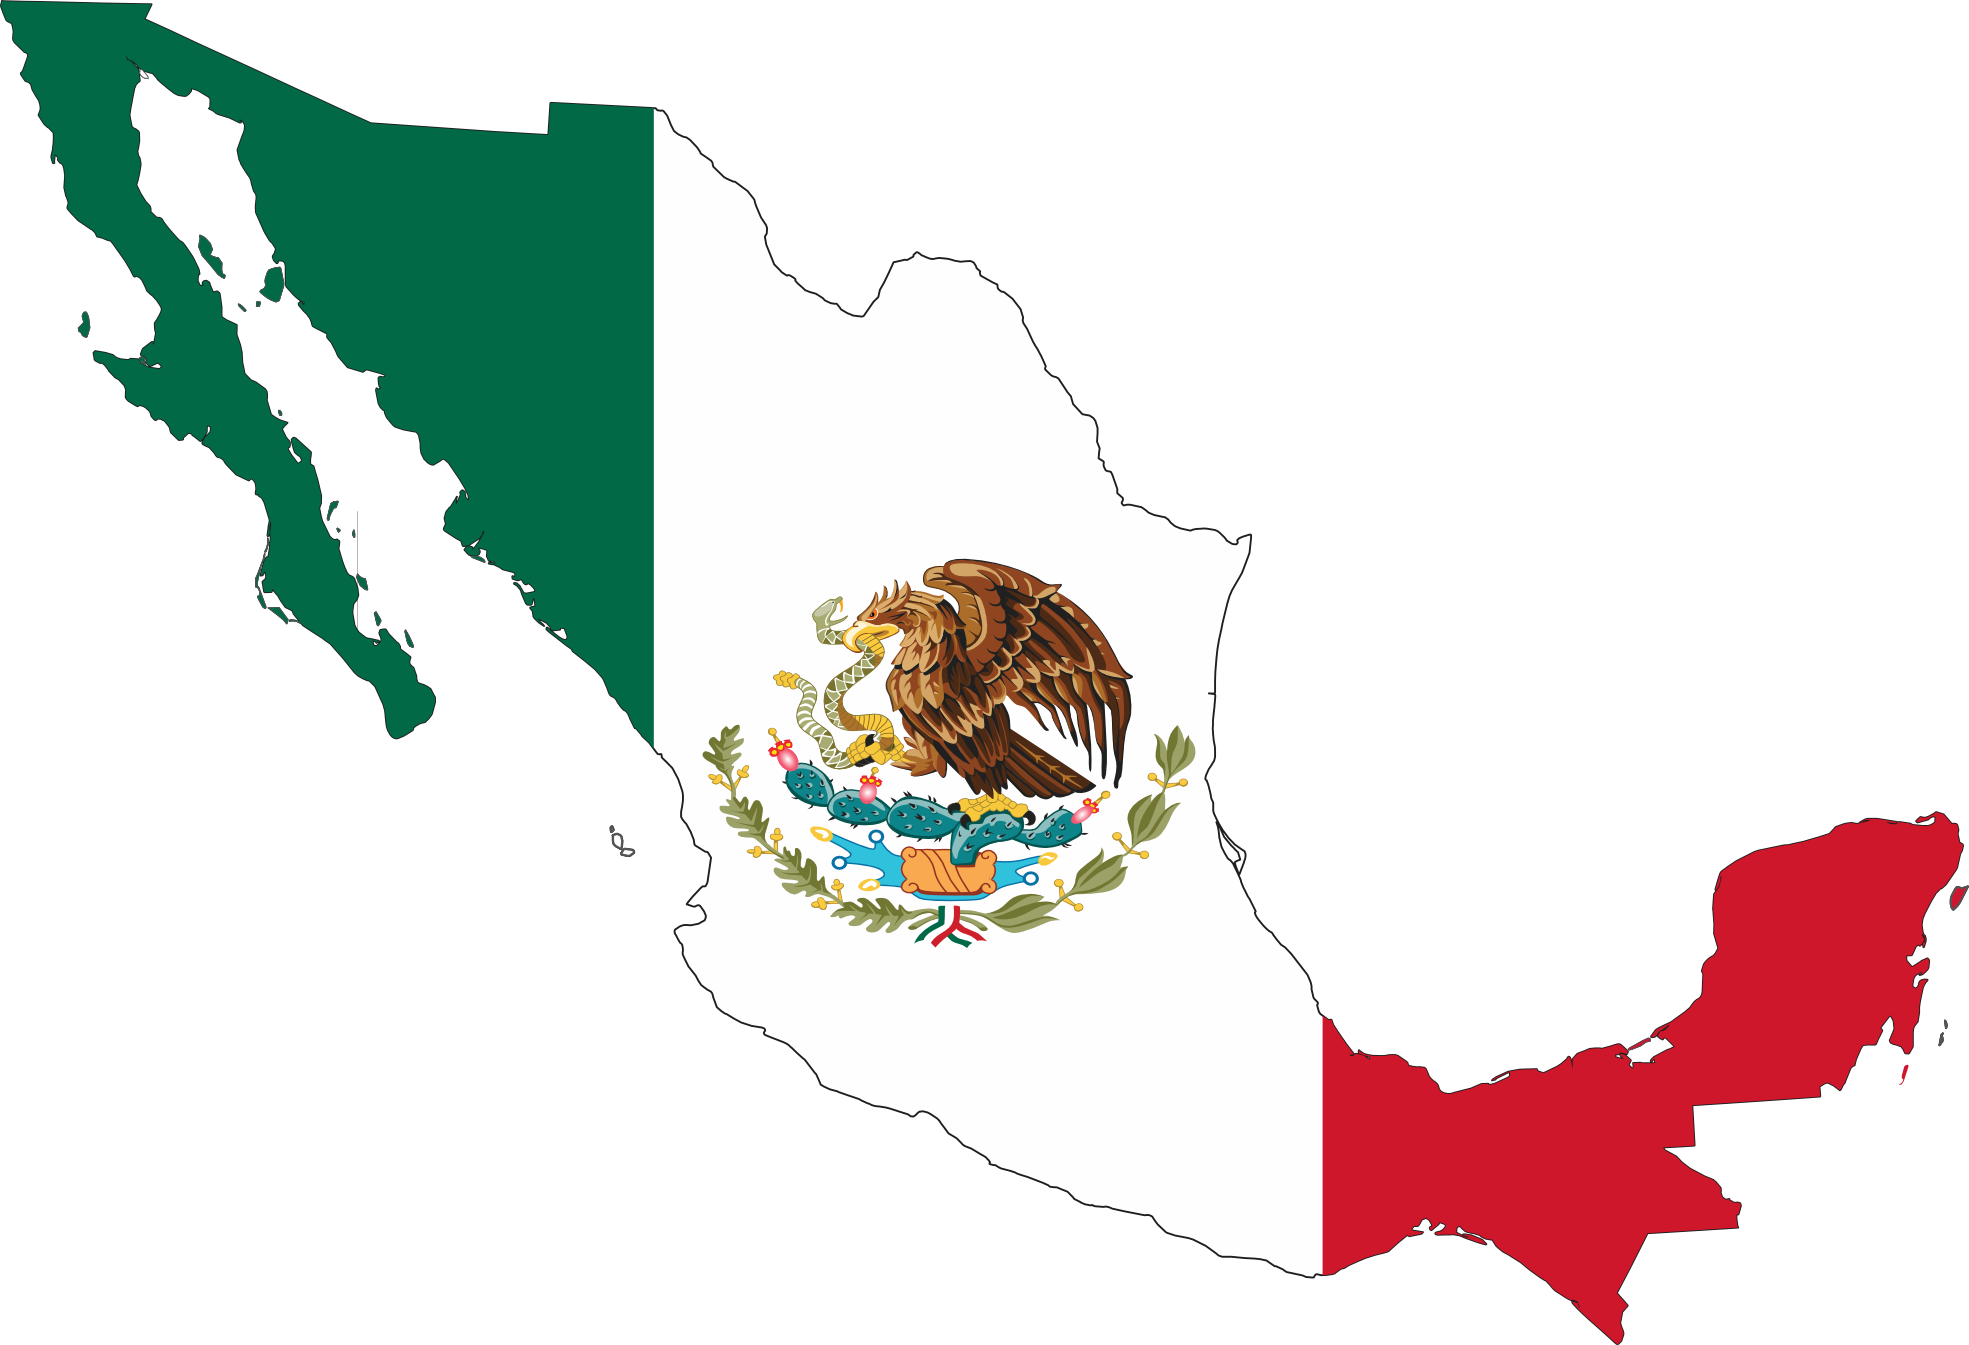 Mexico Clipart & Mexico Clip Art Images.